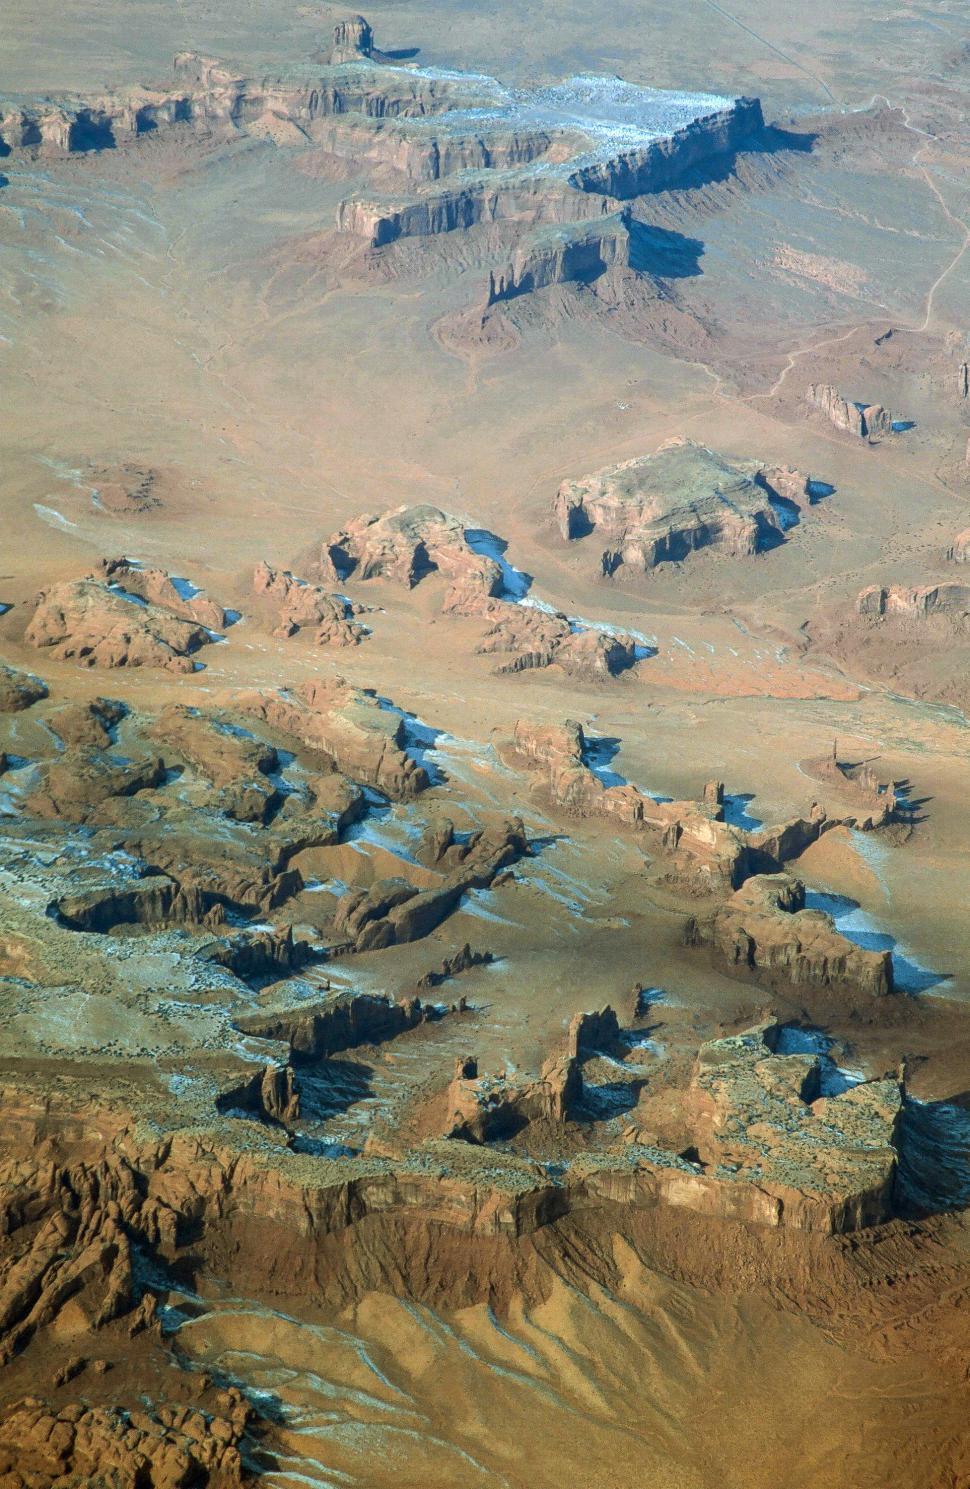 Download Free Stock Photo of Navajo Sandstone Aerial